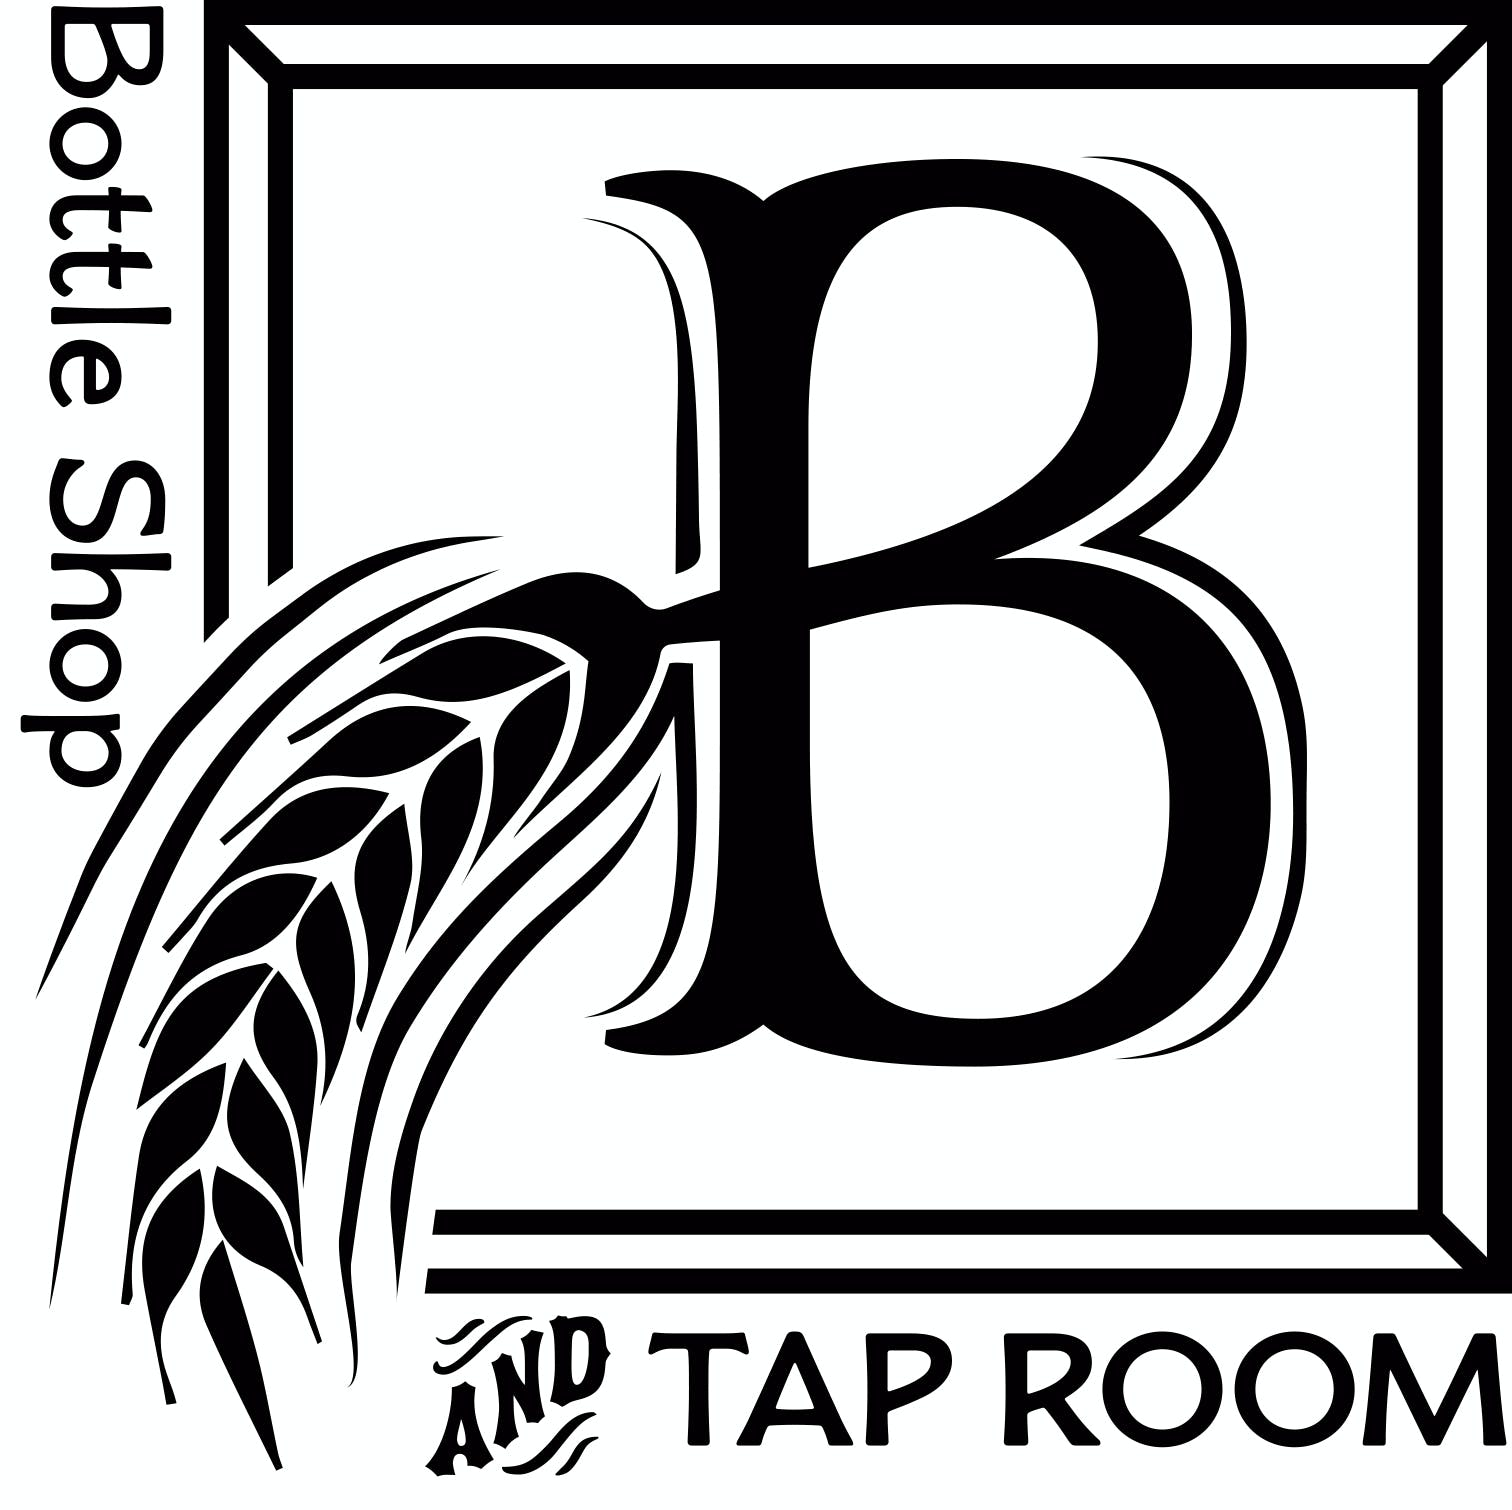 Chattanooga Beer Tap | Barley Chattanooga